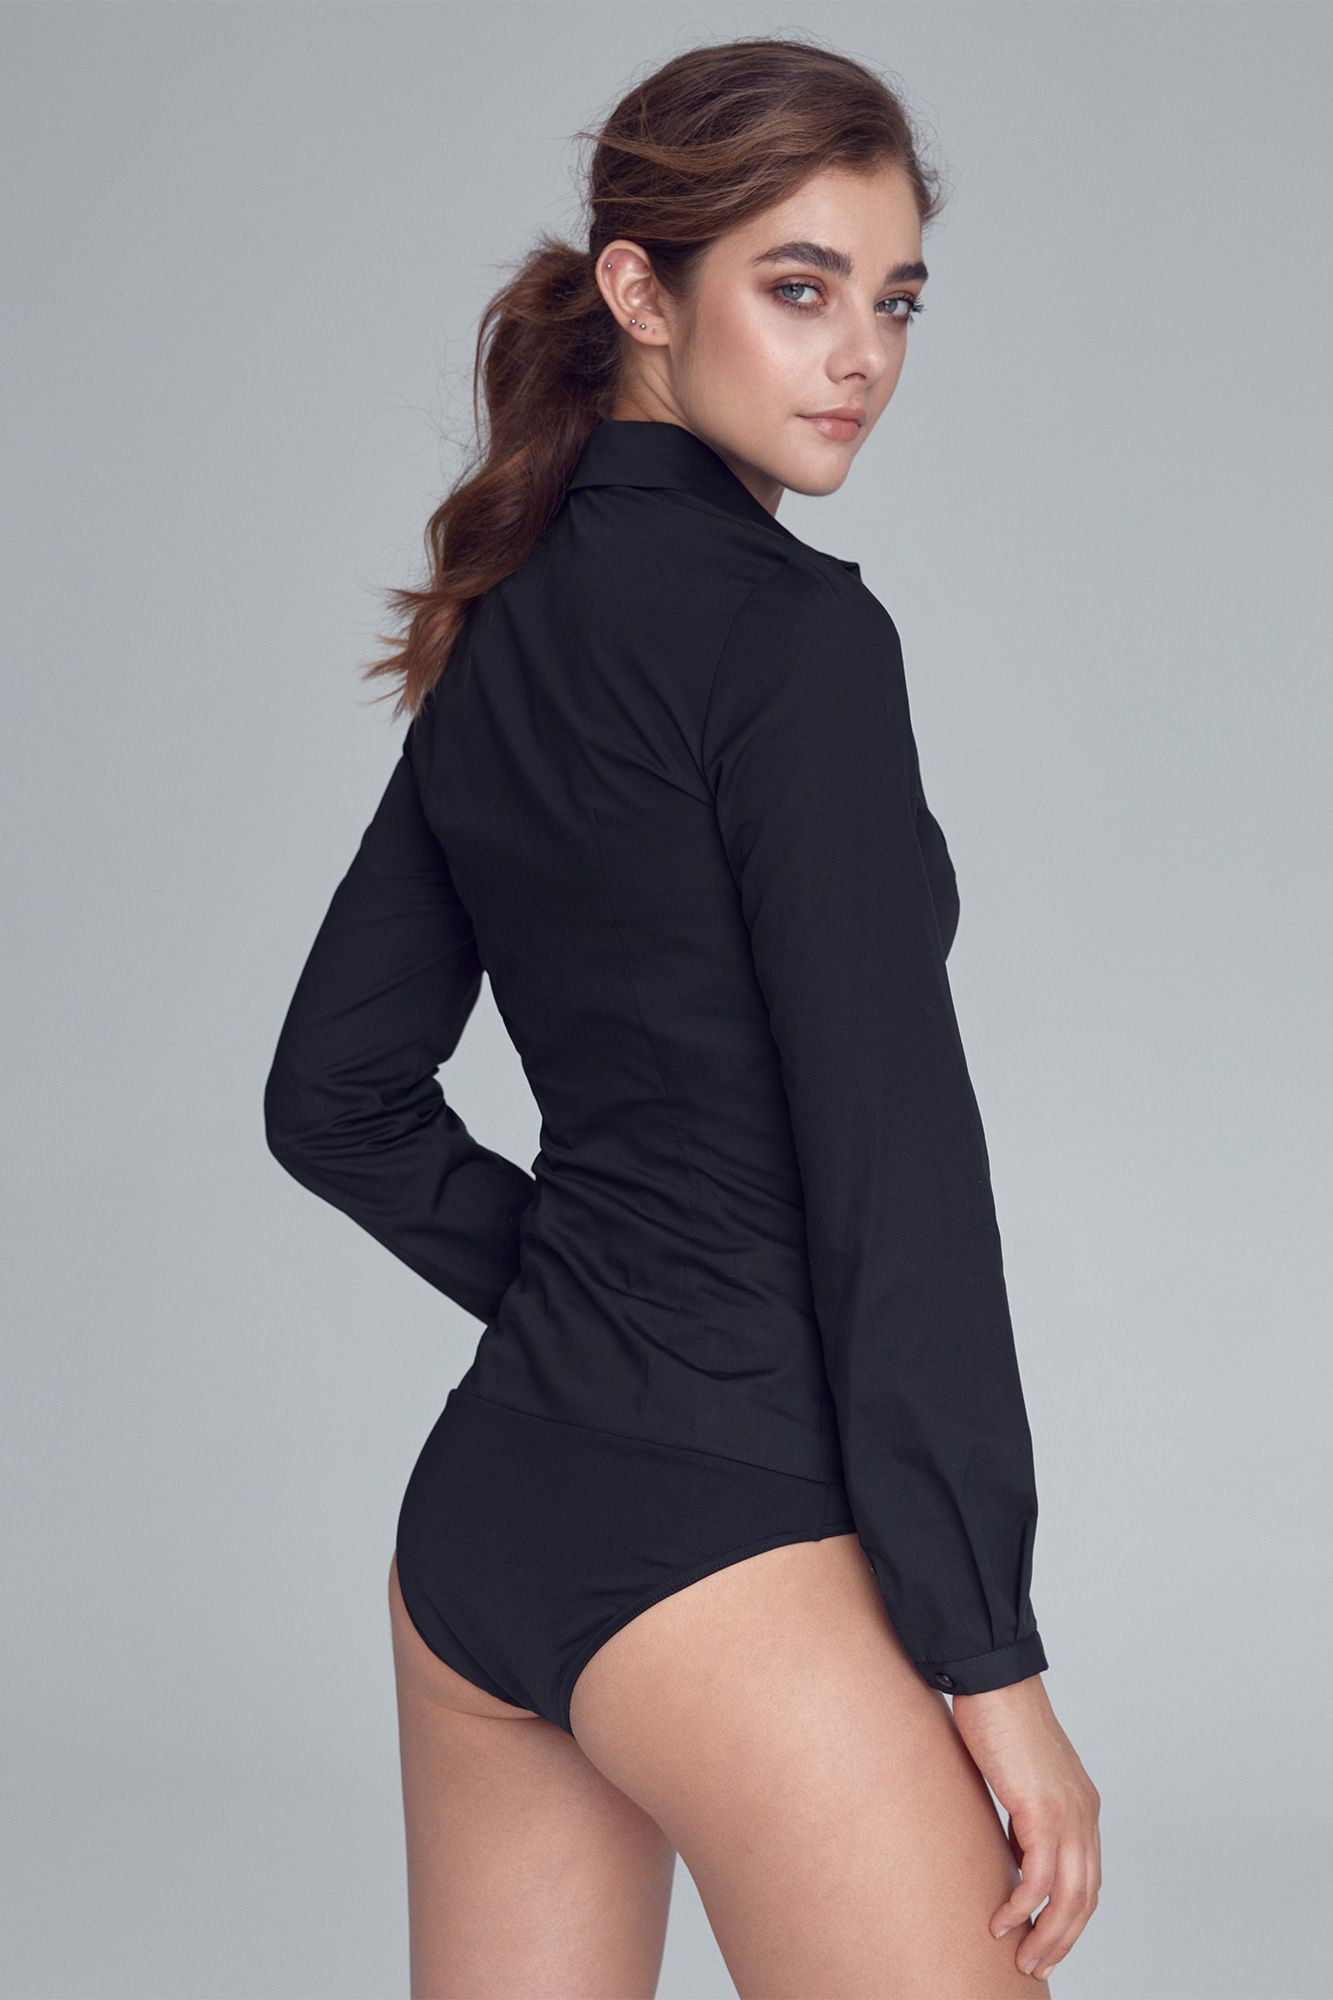 Classic Body Shirt in Black